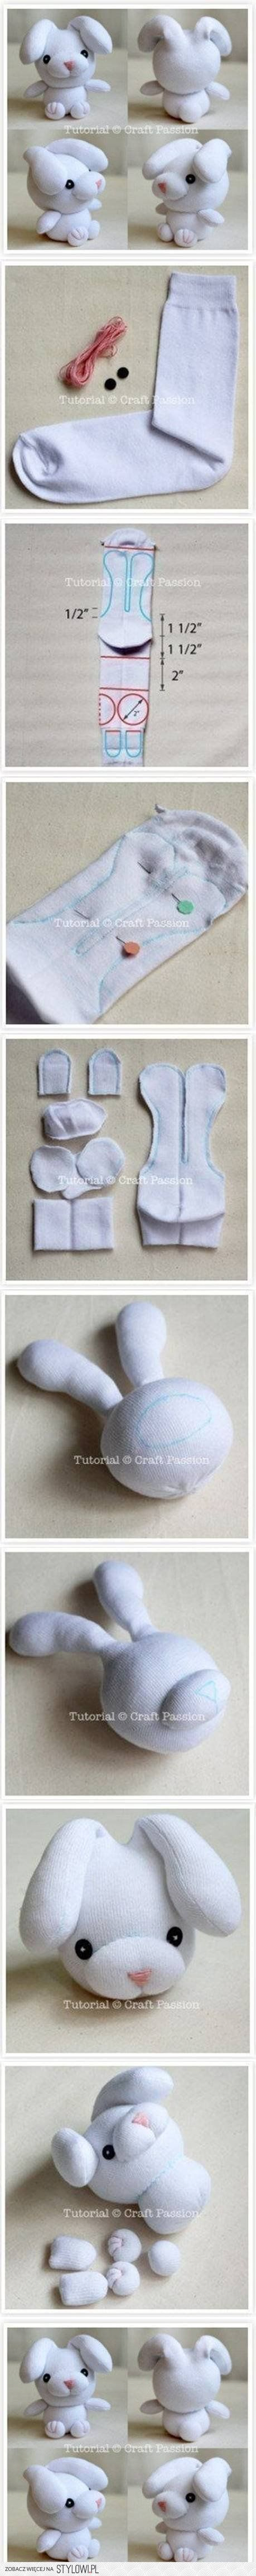 DIY Sew Sock Bunny DIY Projects   UsefulDIY.com na Stylowi.pl